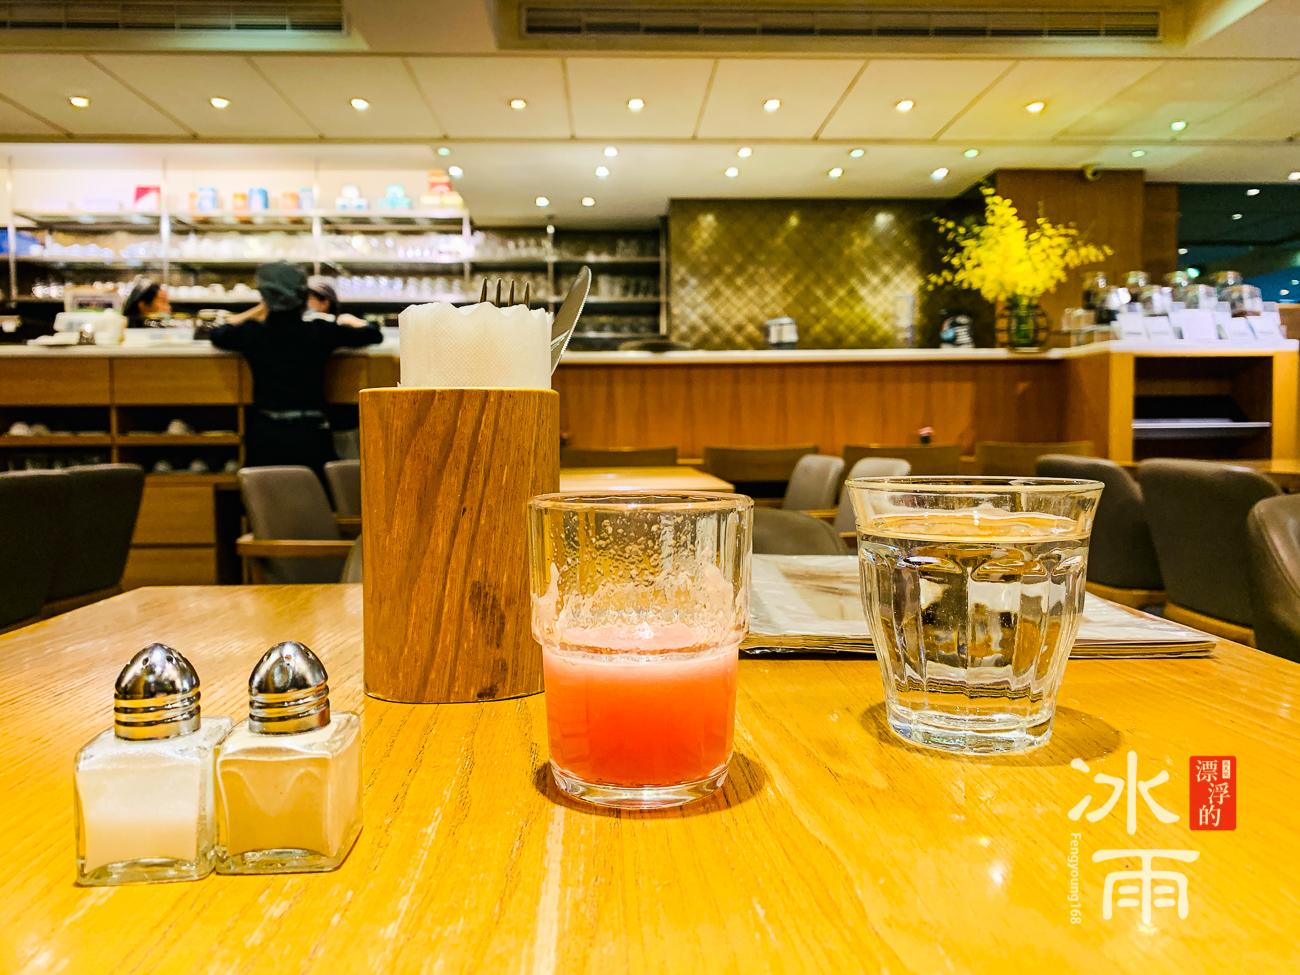 佐曼咖啡Jumane Cafe|佐料罐